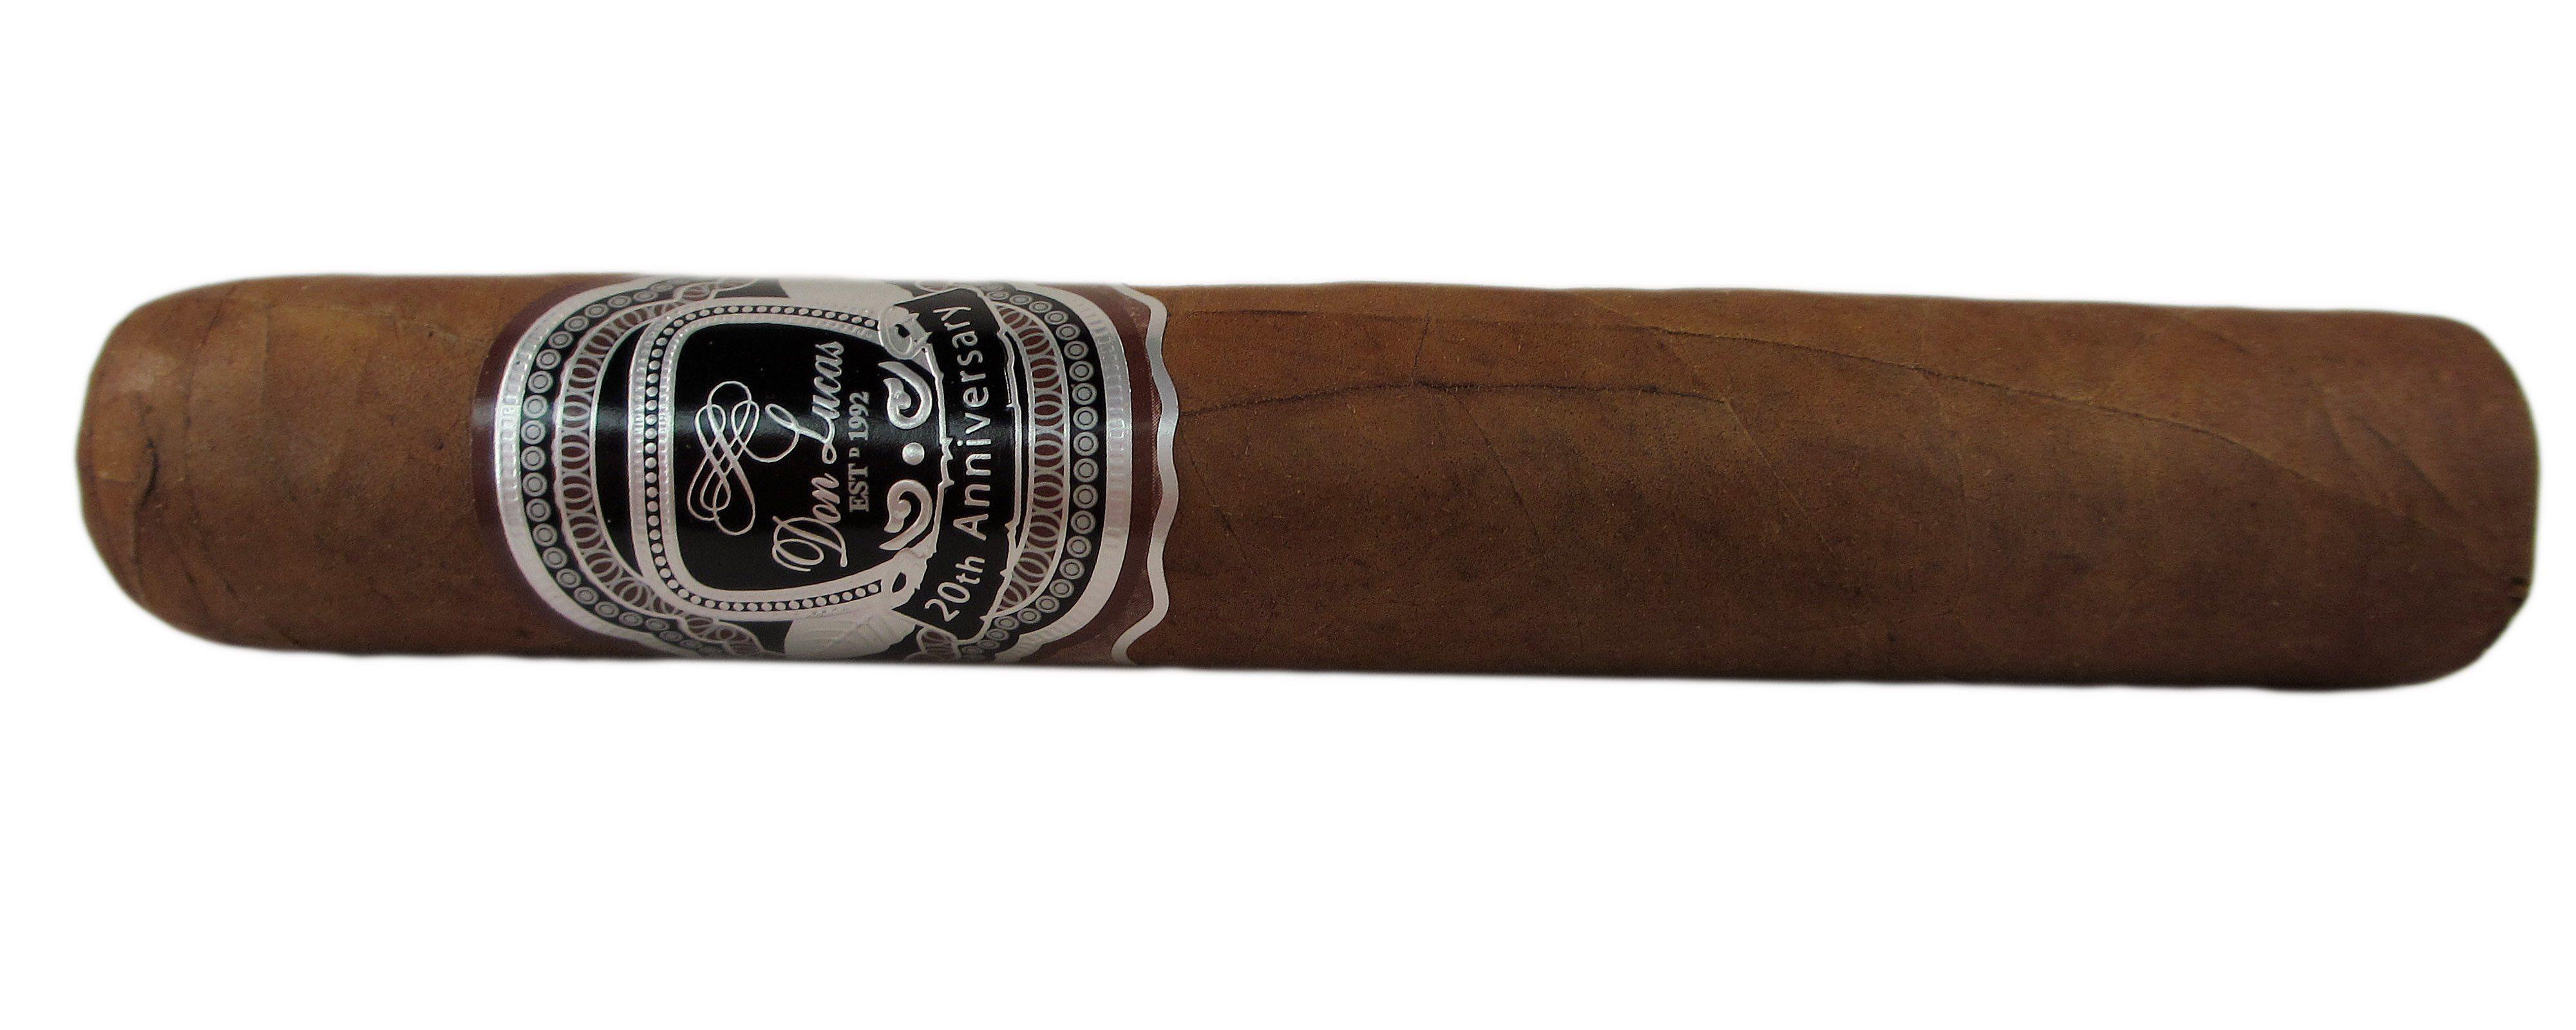 Blind Cigar Review: Don Lucas | 20th Anniversary Robusto Gordo Aniversario